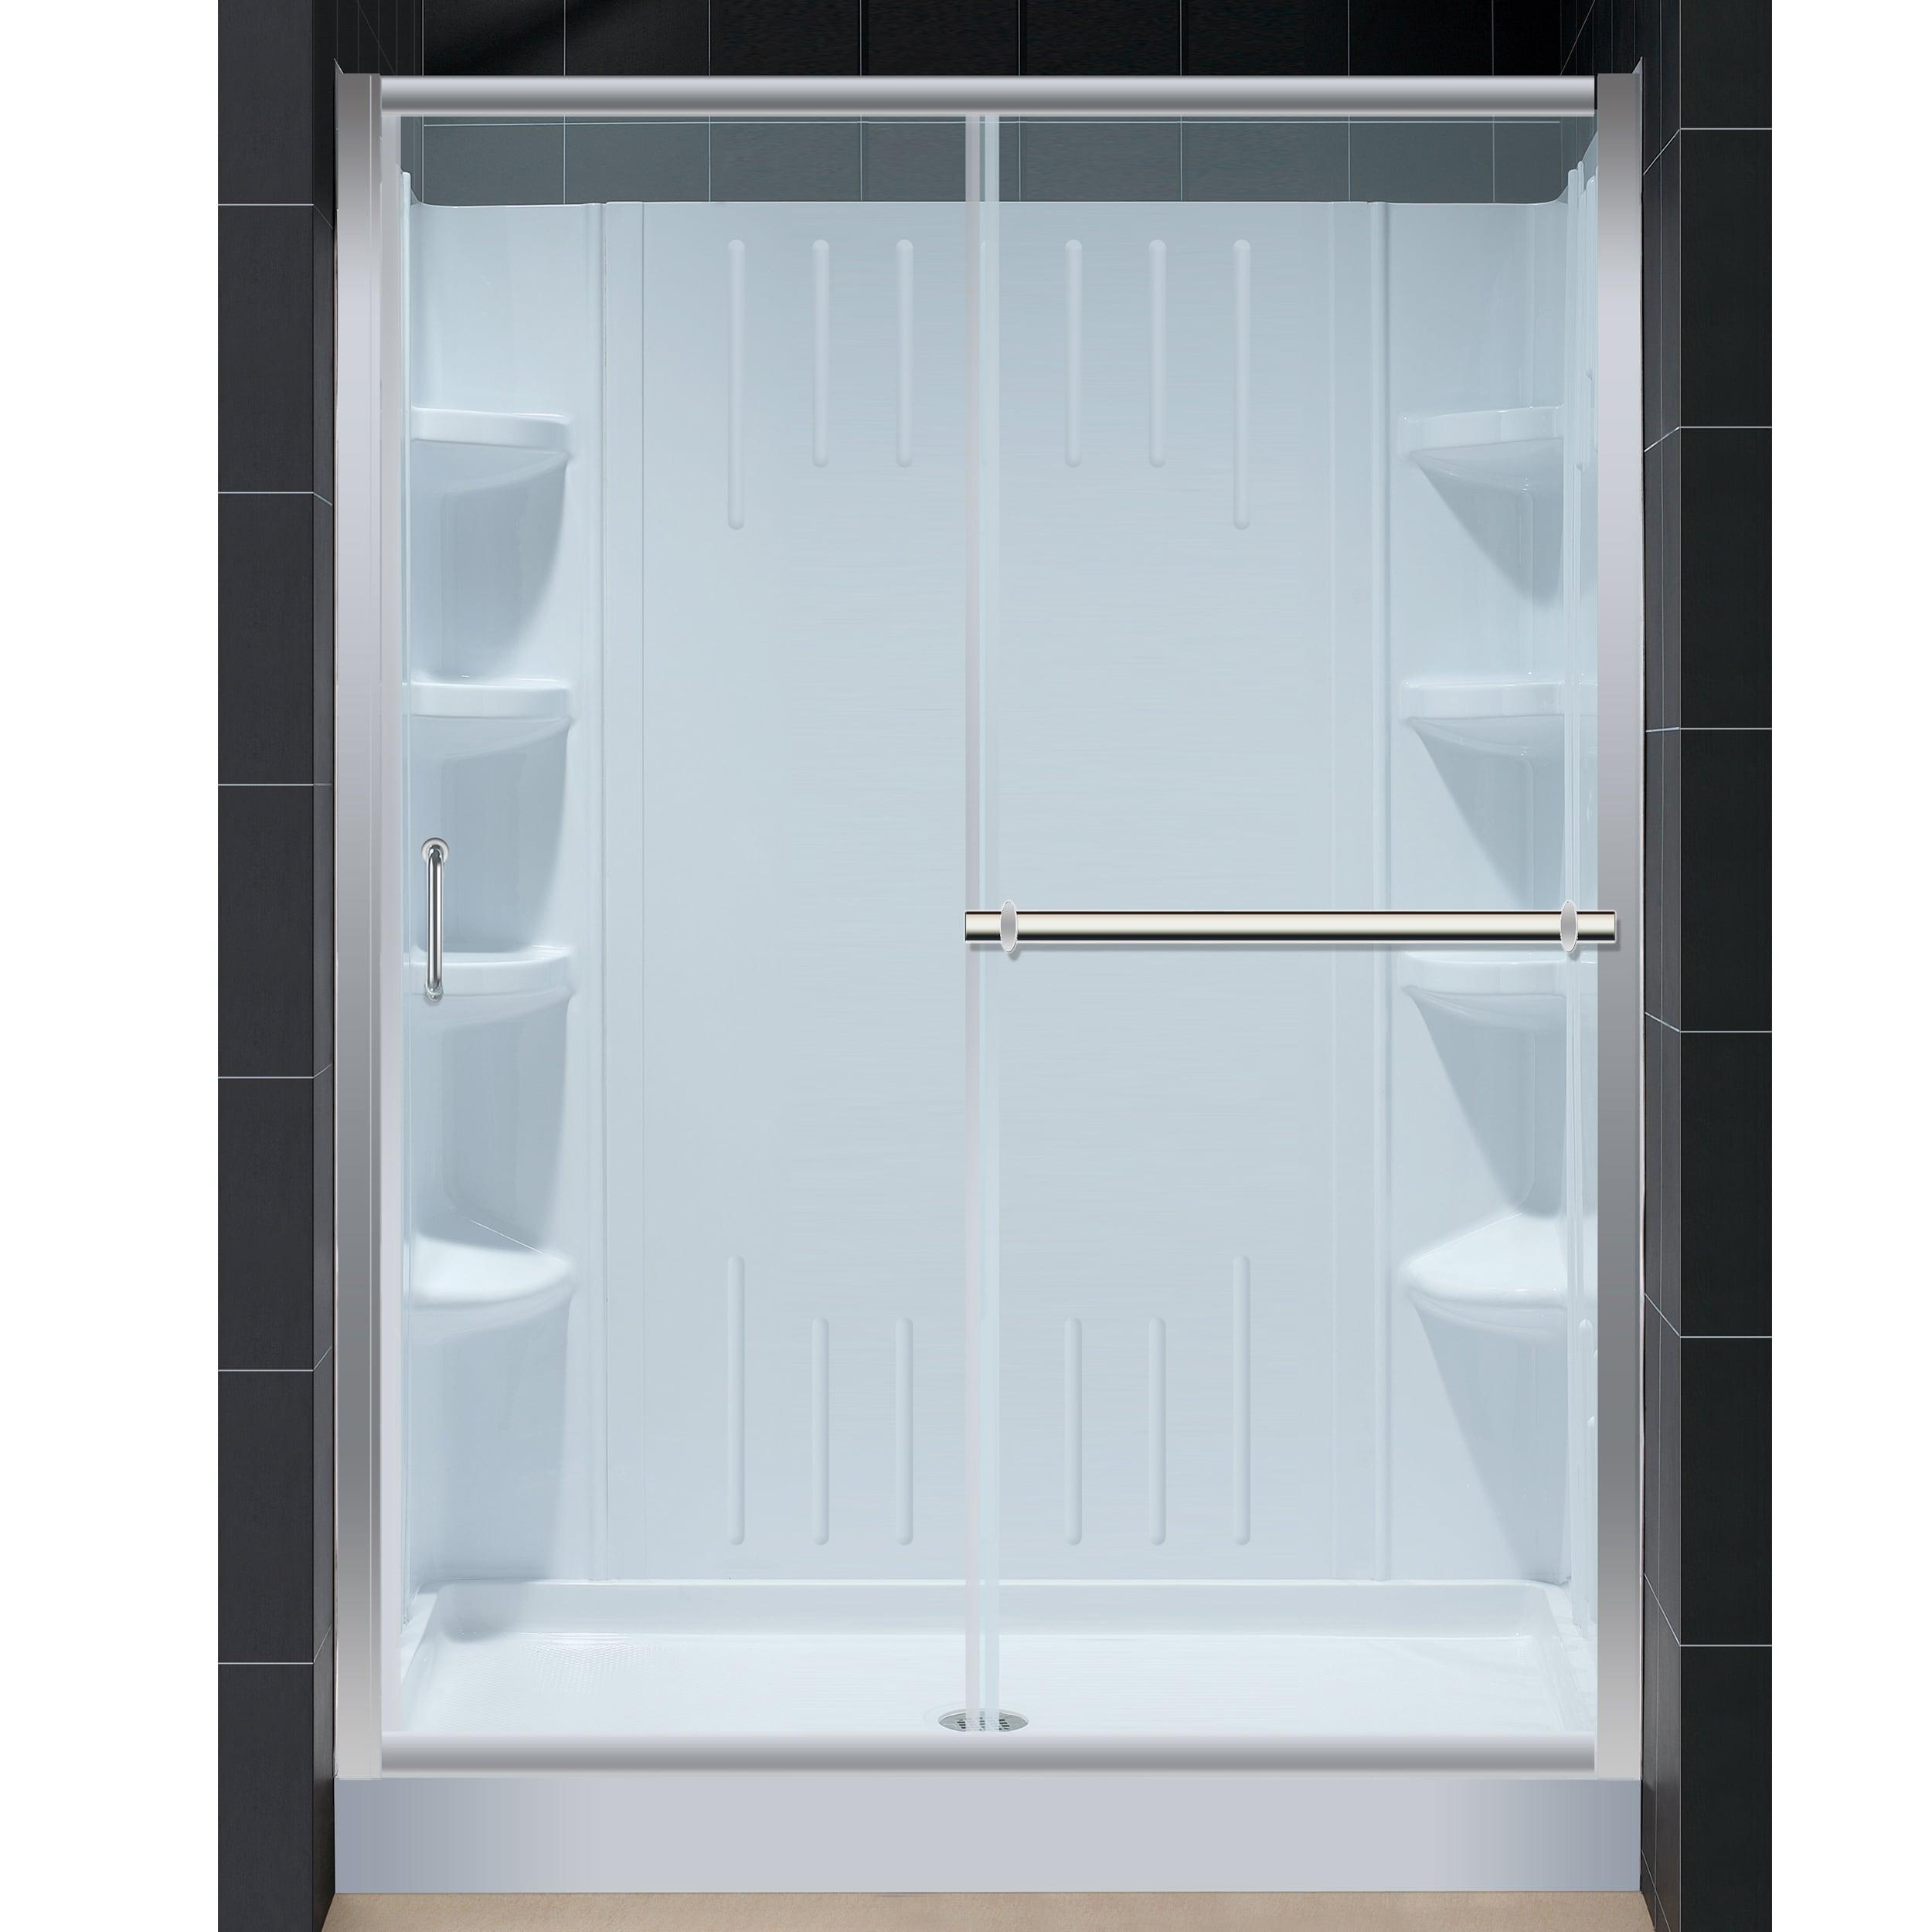 dreamline infinity plus 60x72 shower door amazon 32x60 shower base backwall overstock. Black Bedroom Furniture Sets. Home Design Ideas